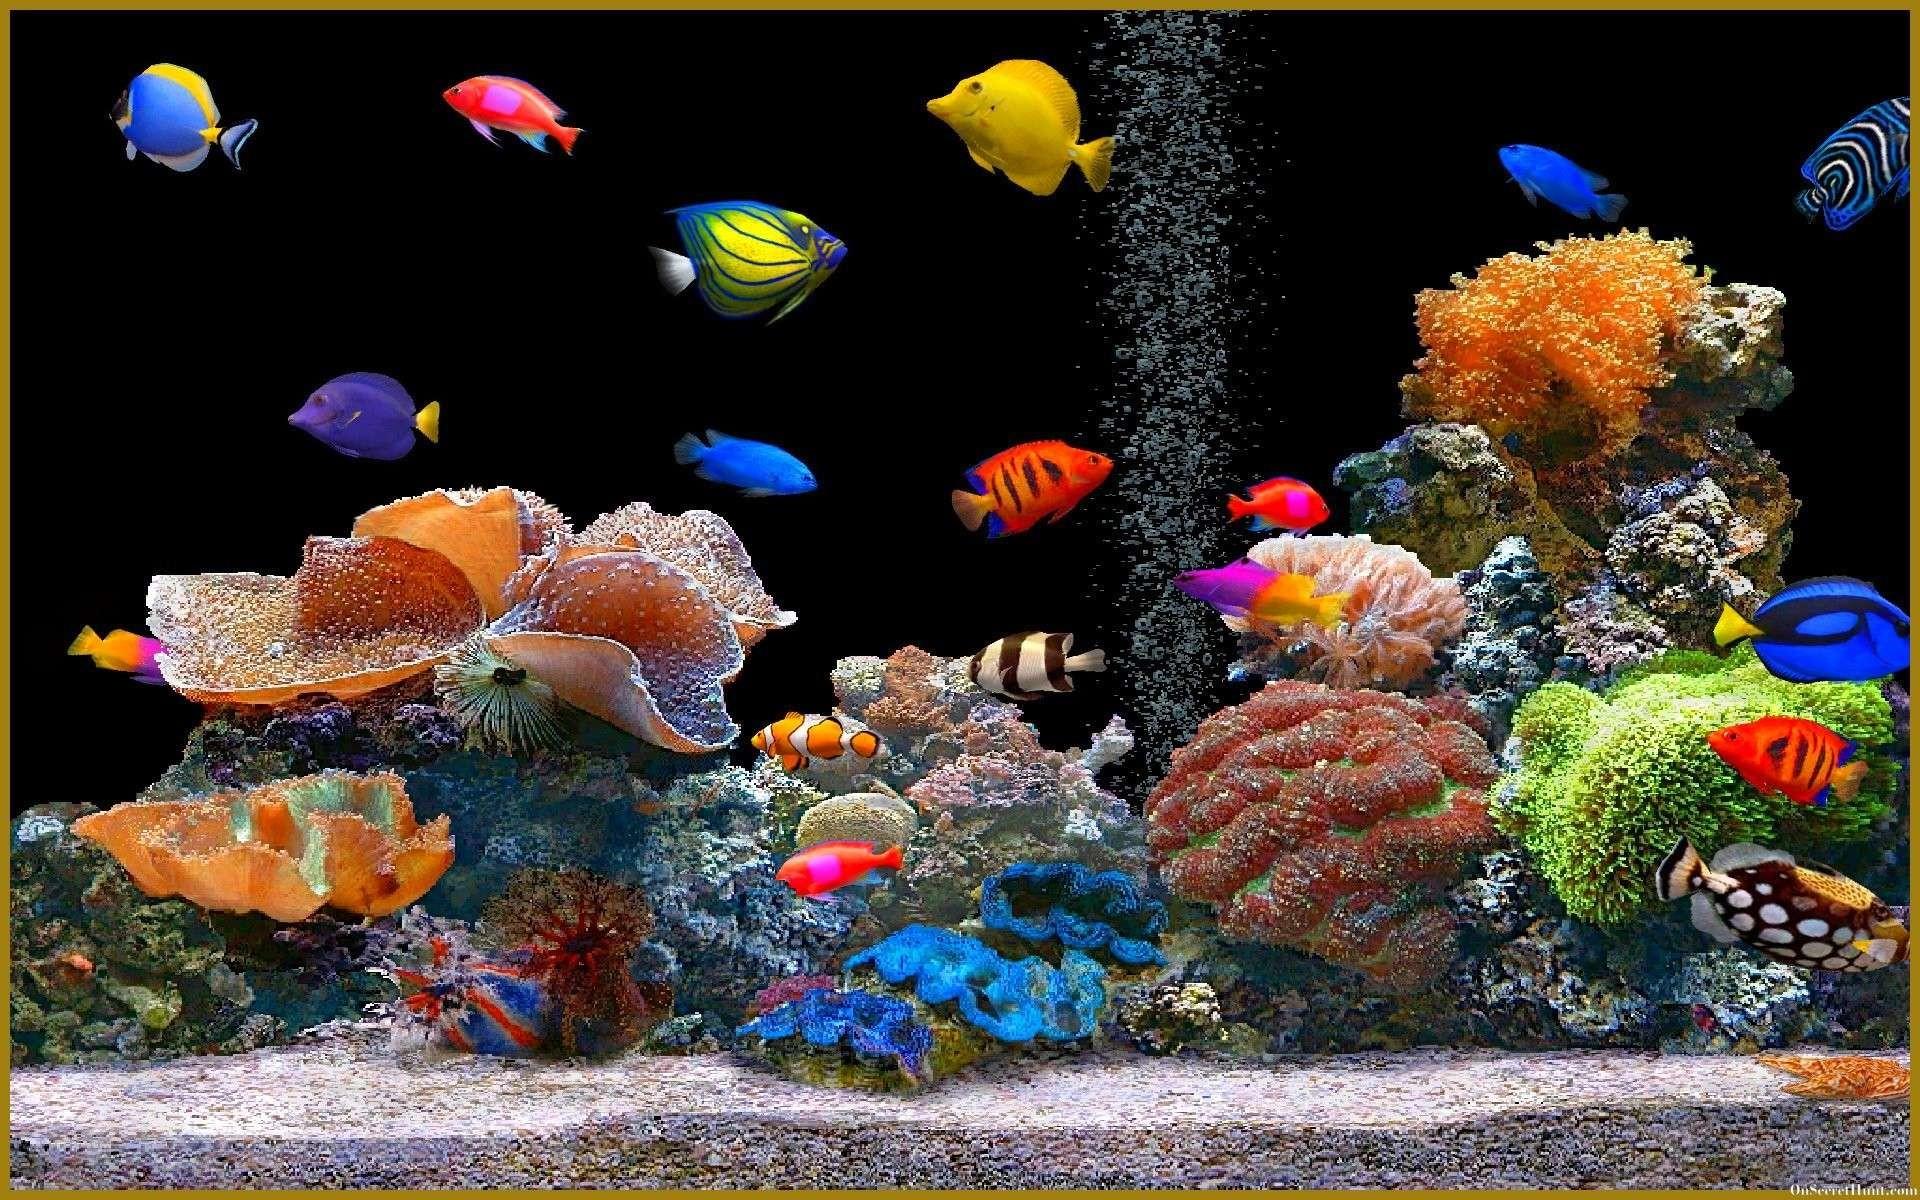 Res: 1920x1200, KY765: Free Aquarium Desktop Wallpaper, , by Devora Penniman